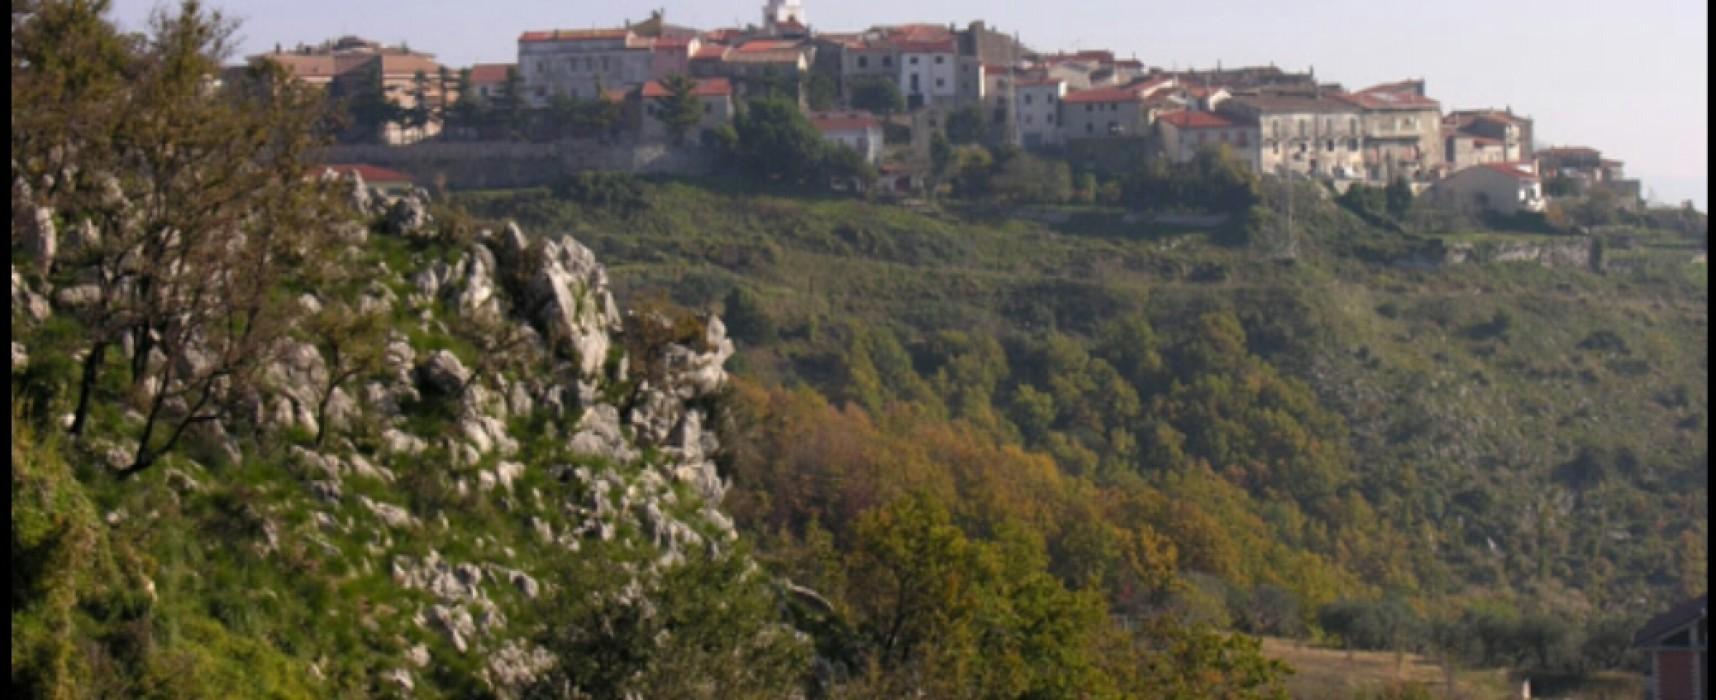 Vacanze, Turismo rurale in crescita